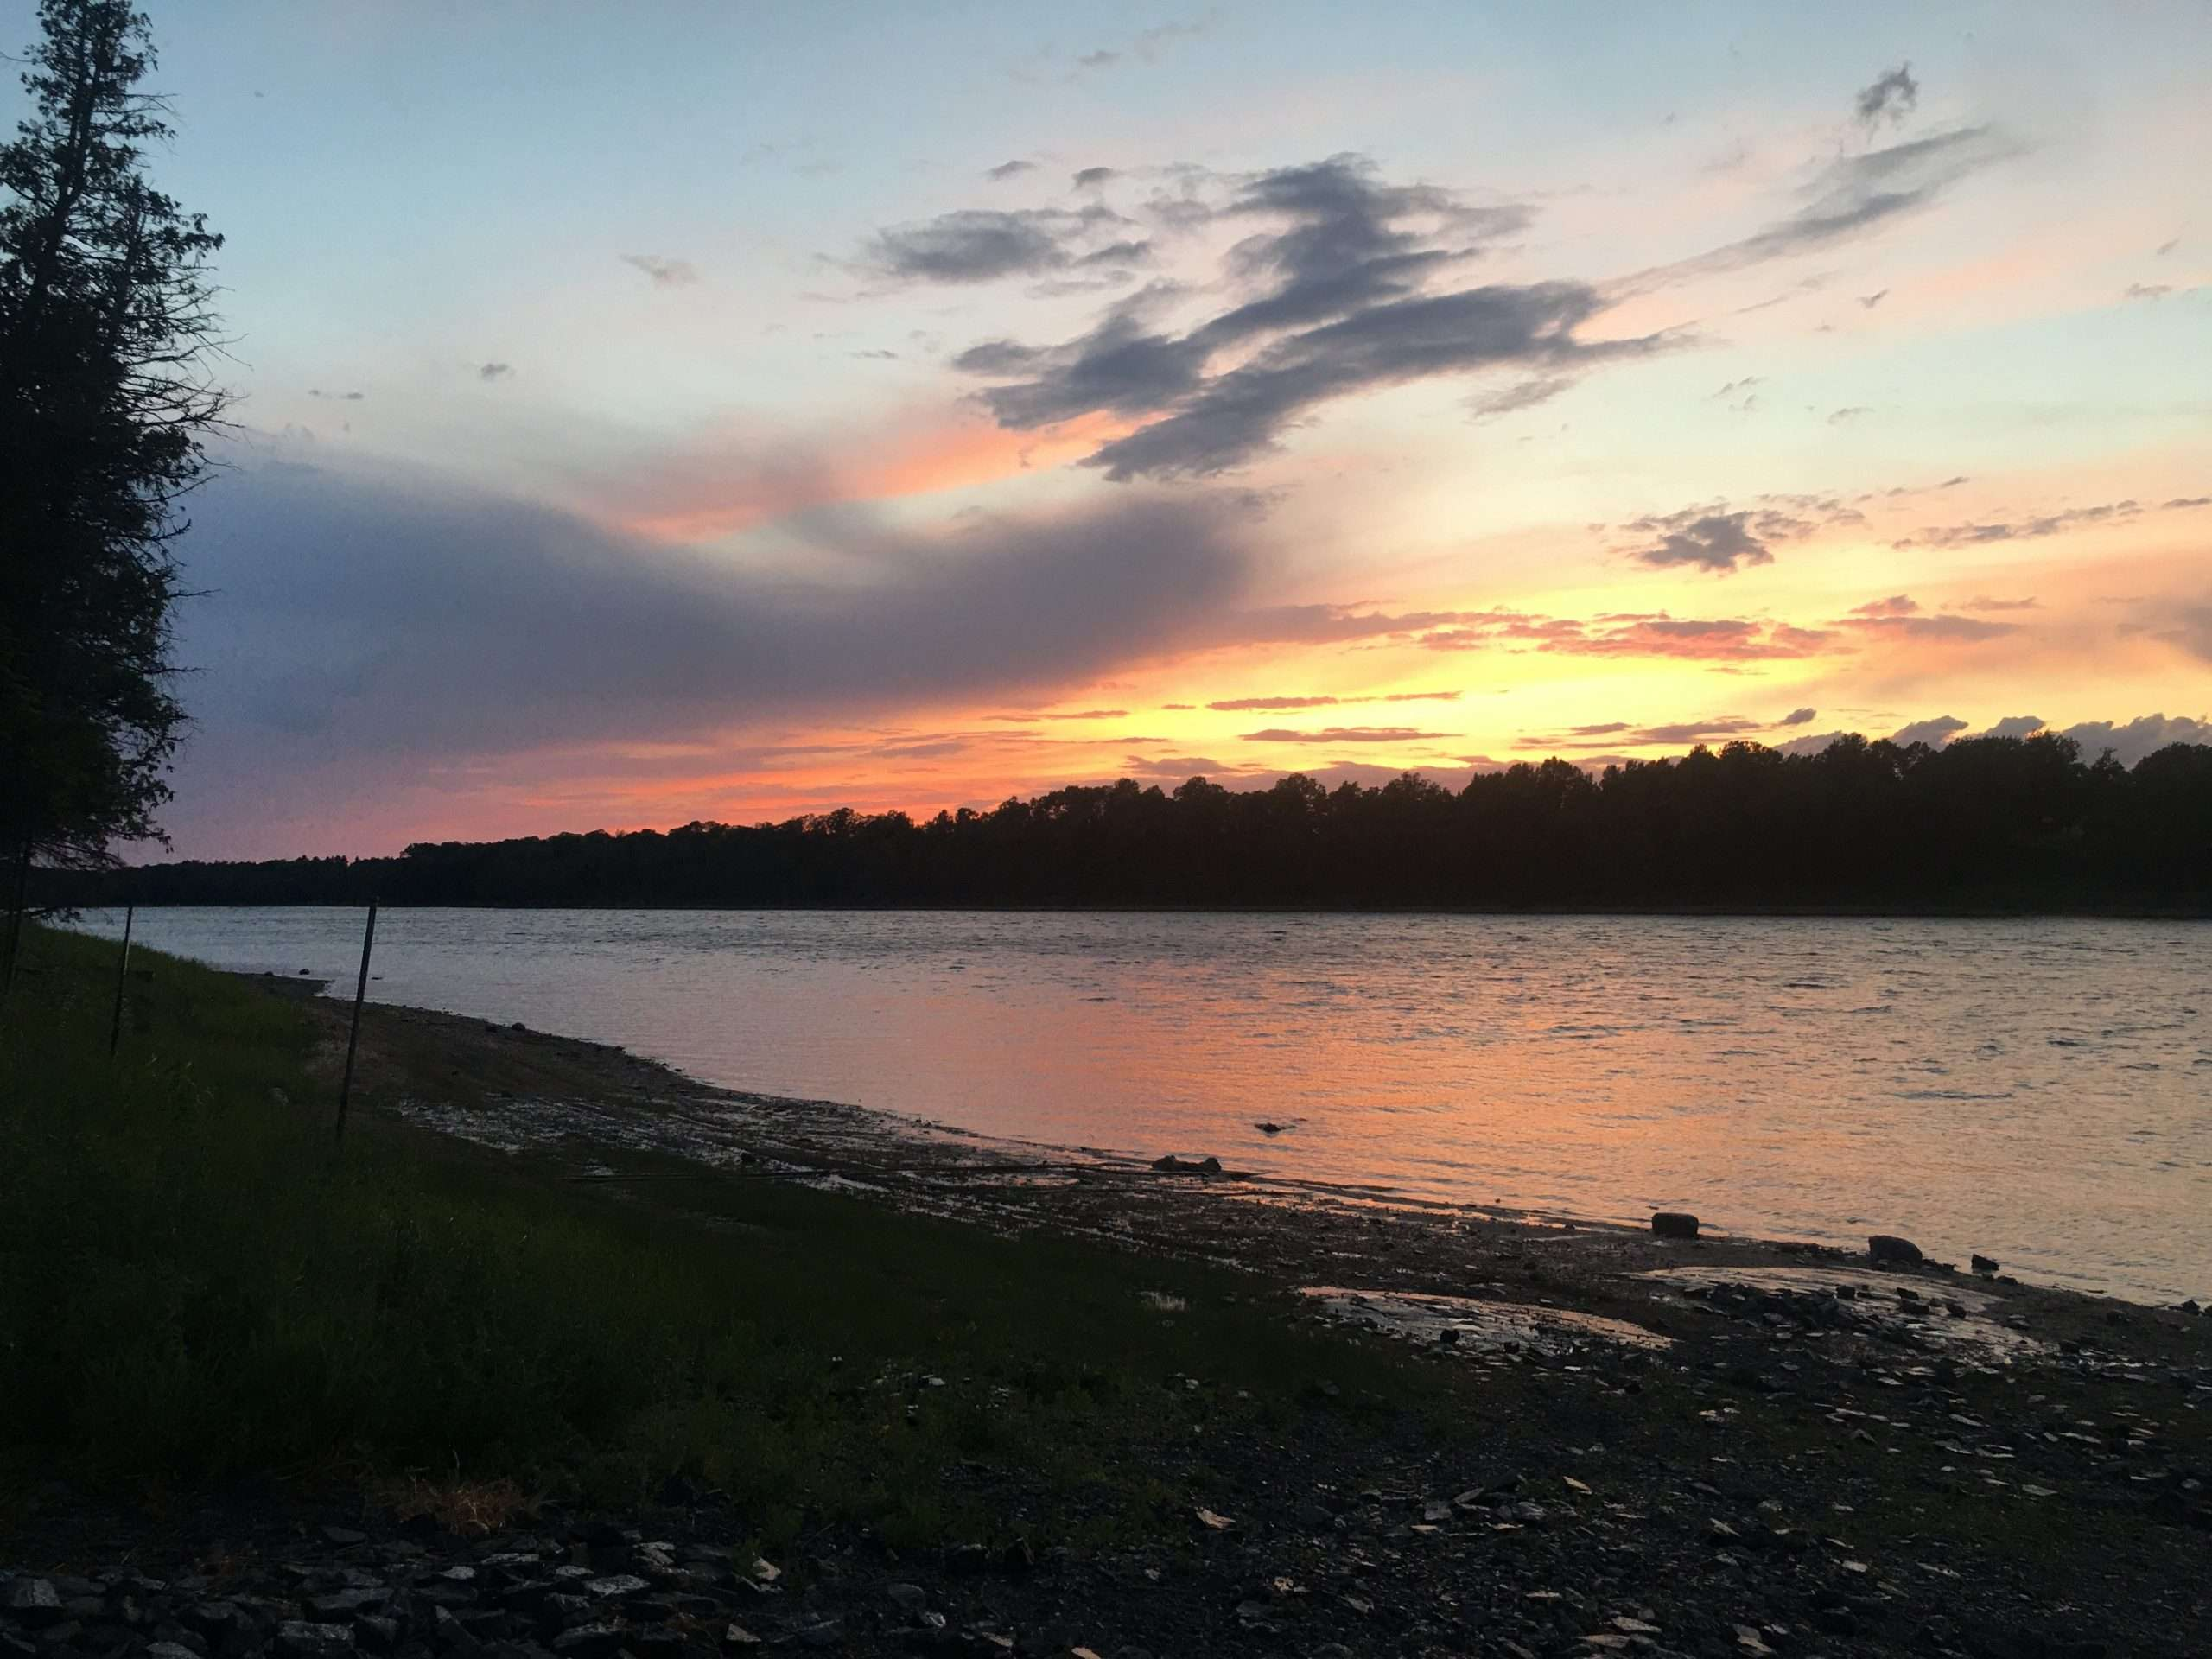 the sun sets across a river